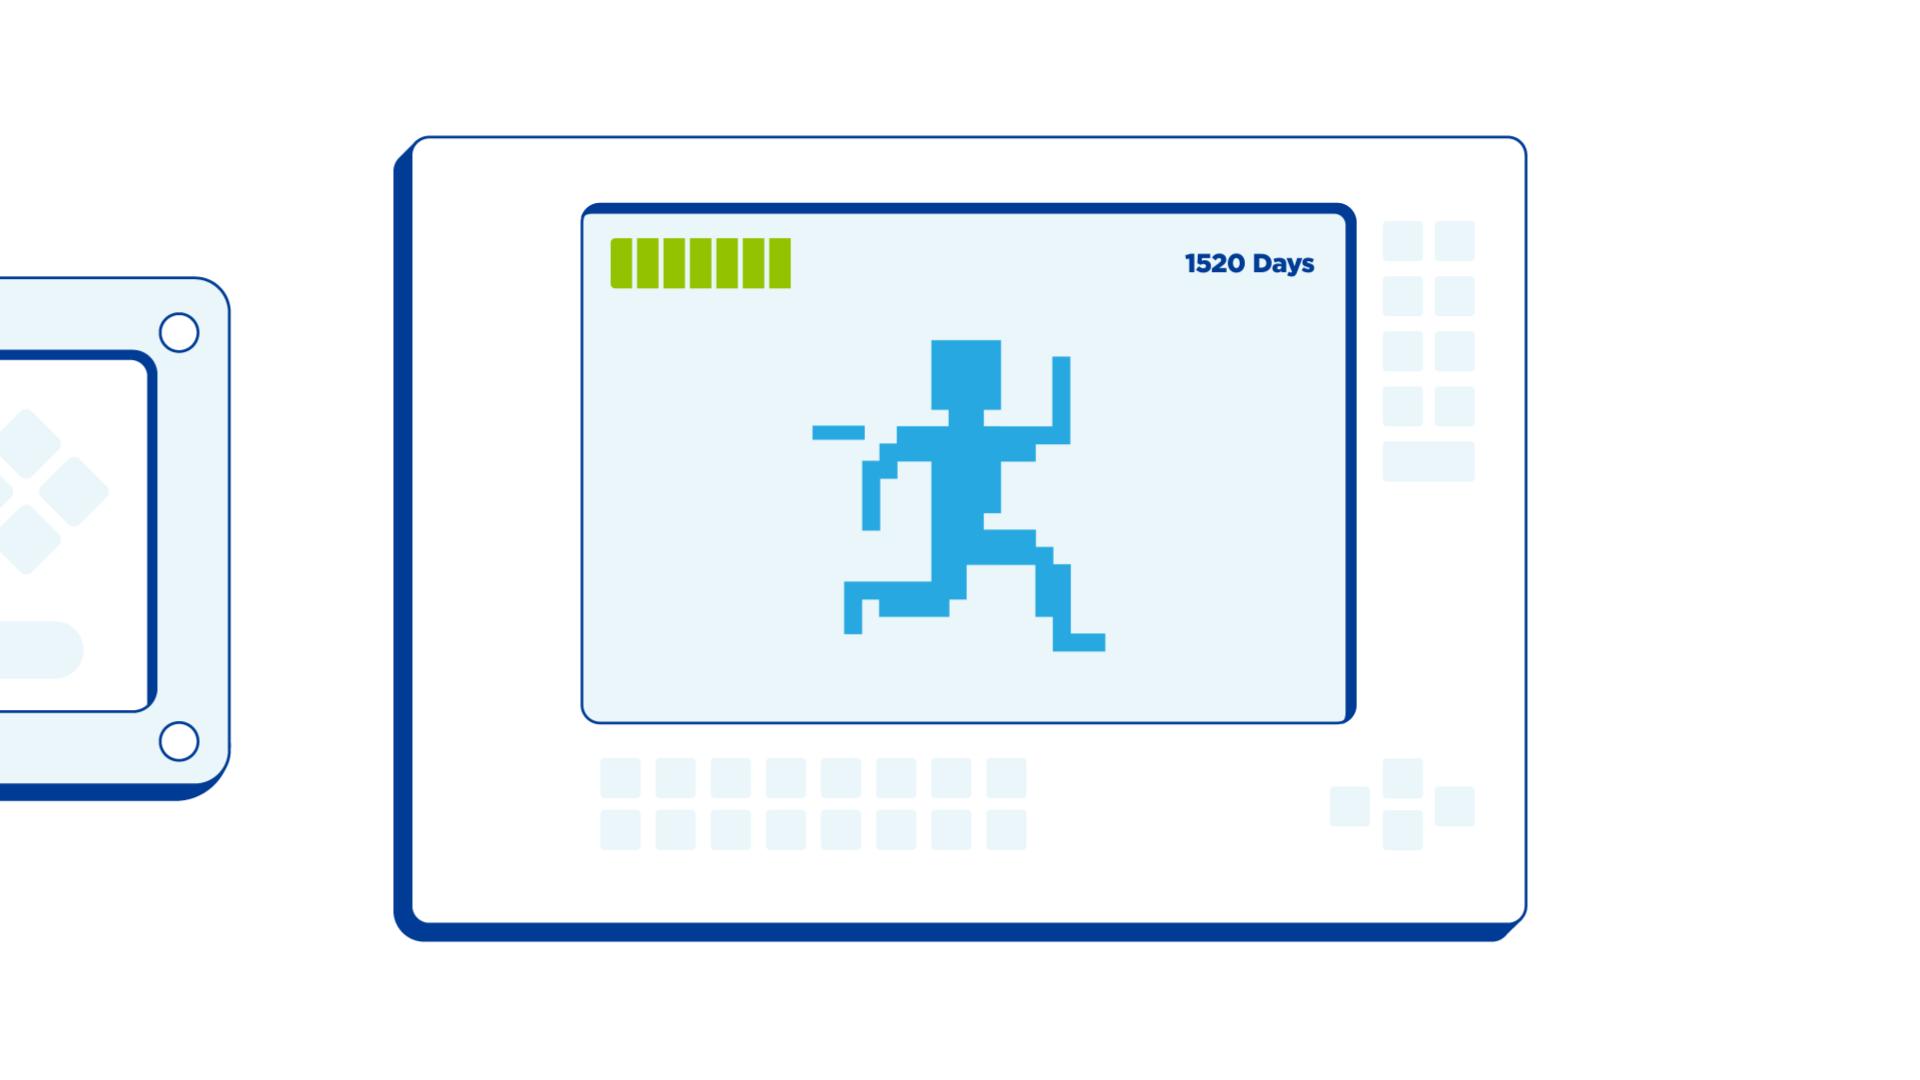 Illustration of control system